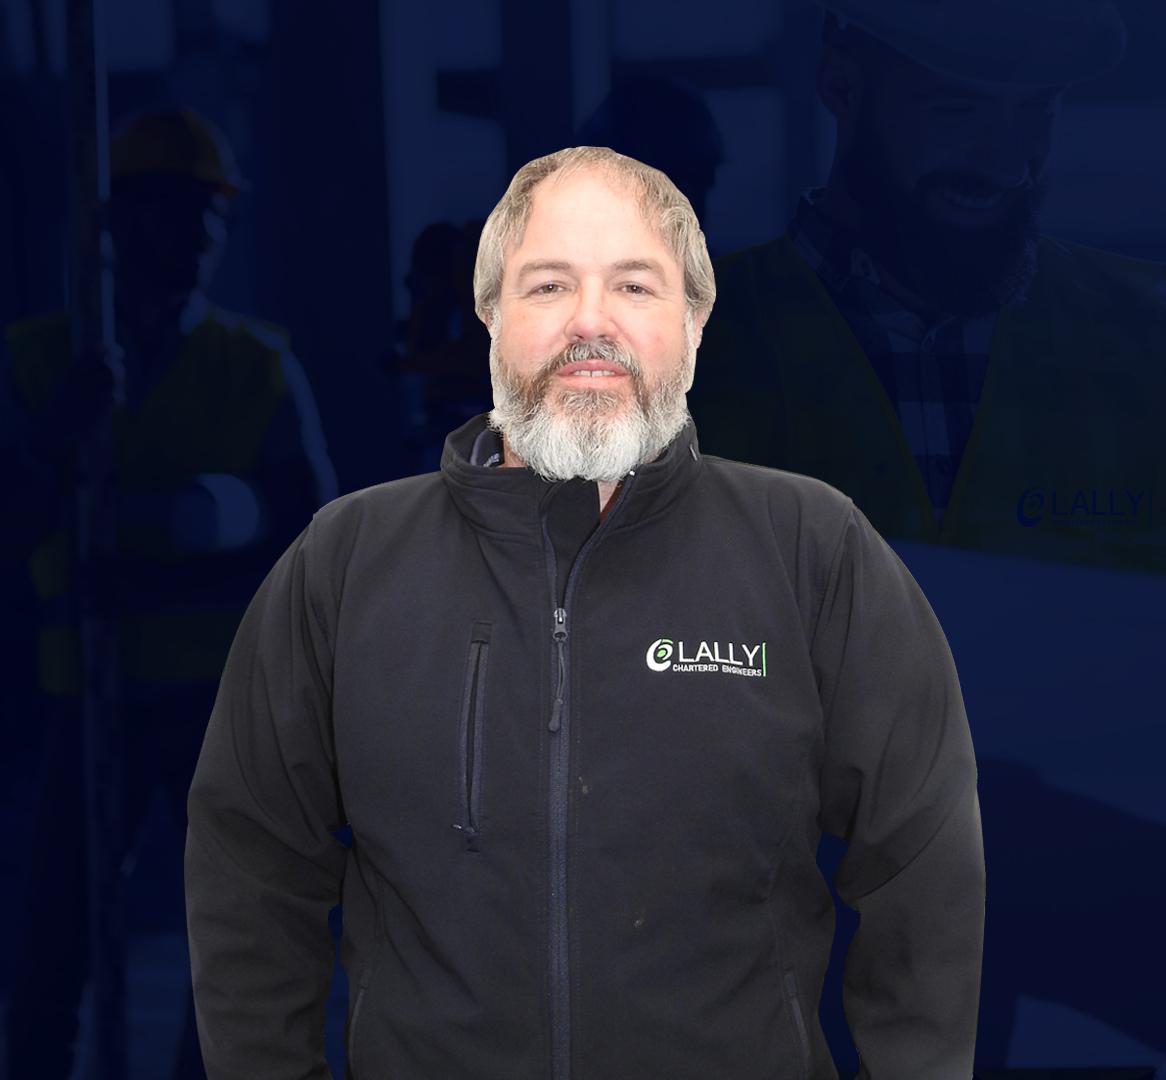 Daniel Gadd, Registered Building Surveyor, Lally Chartered Engineers, Mayo, Ireland